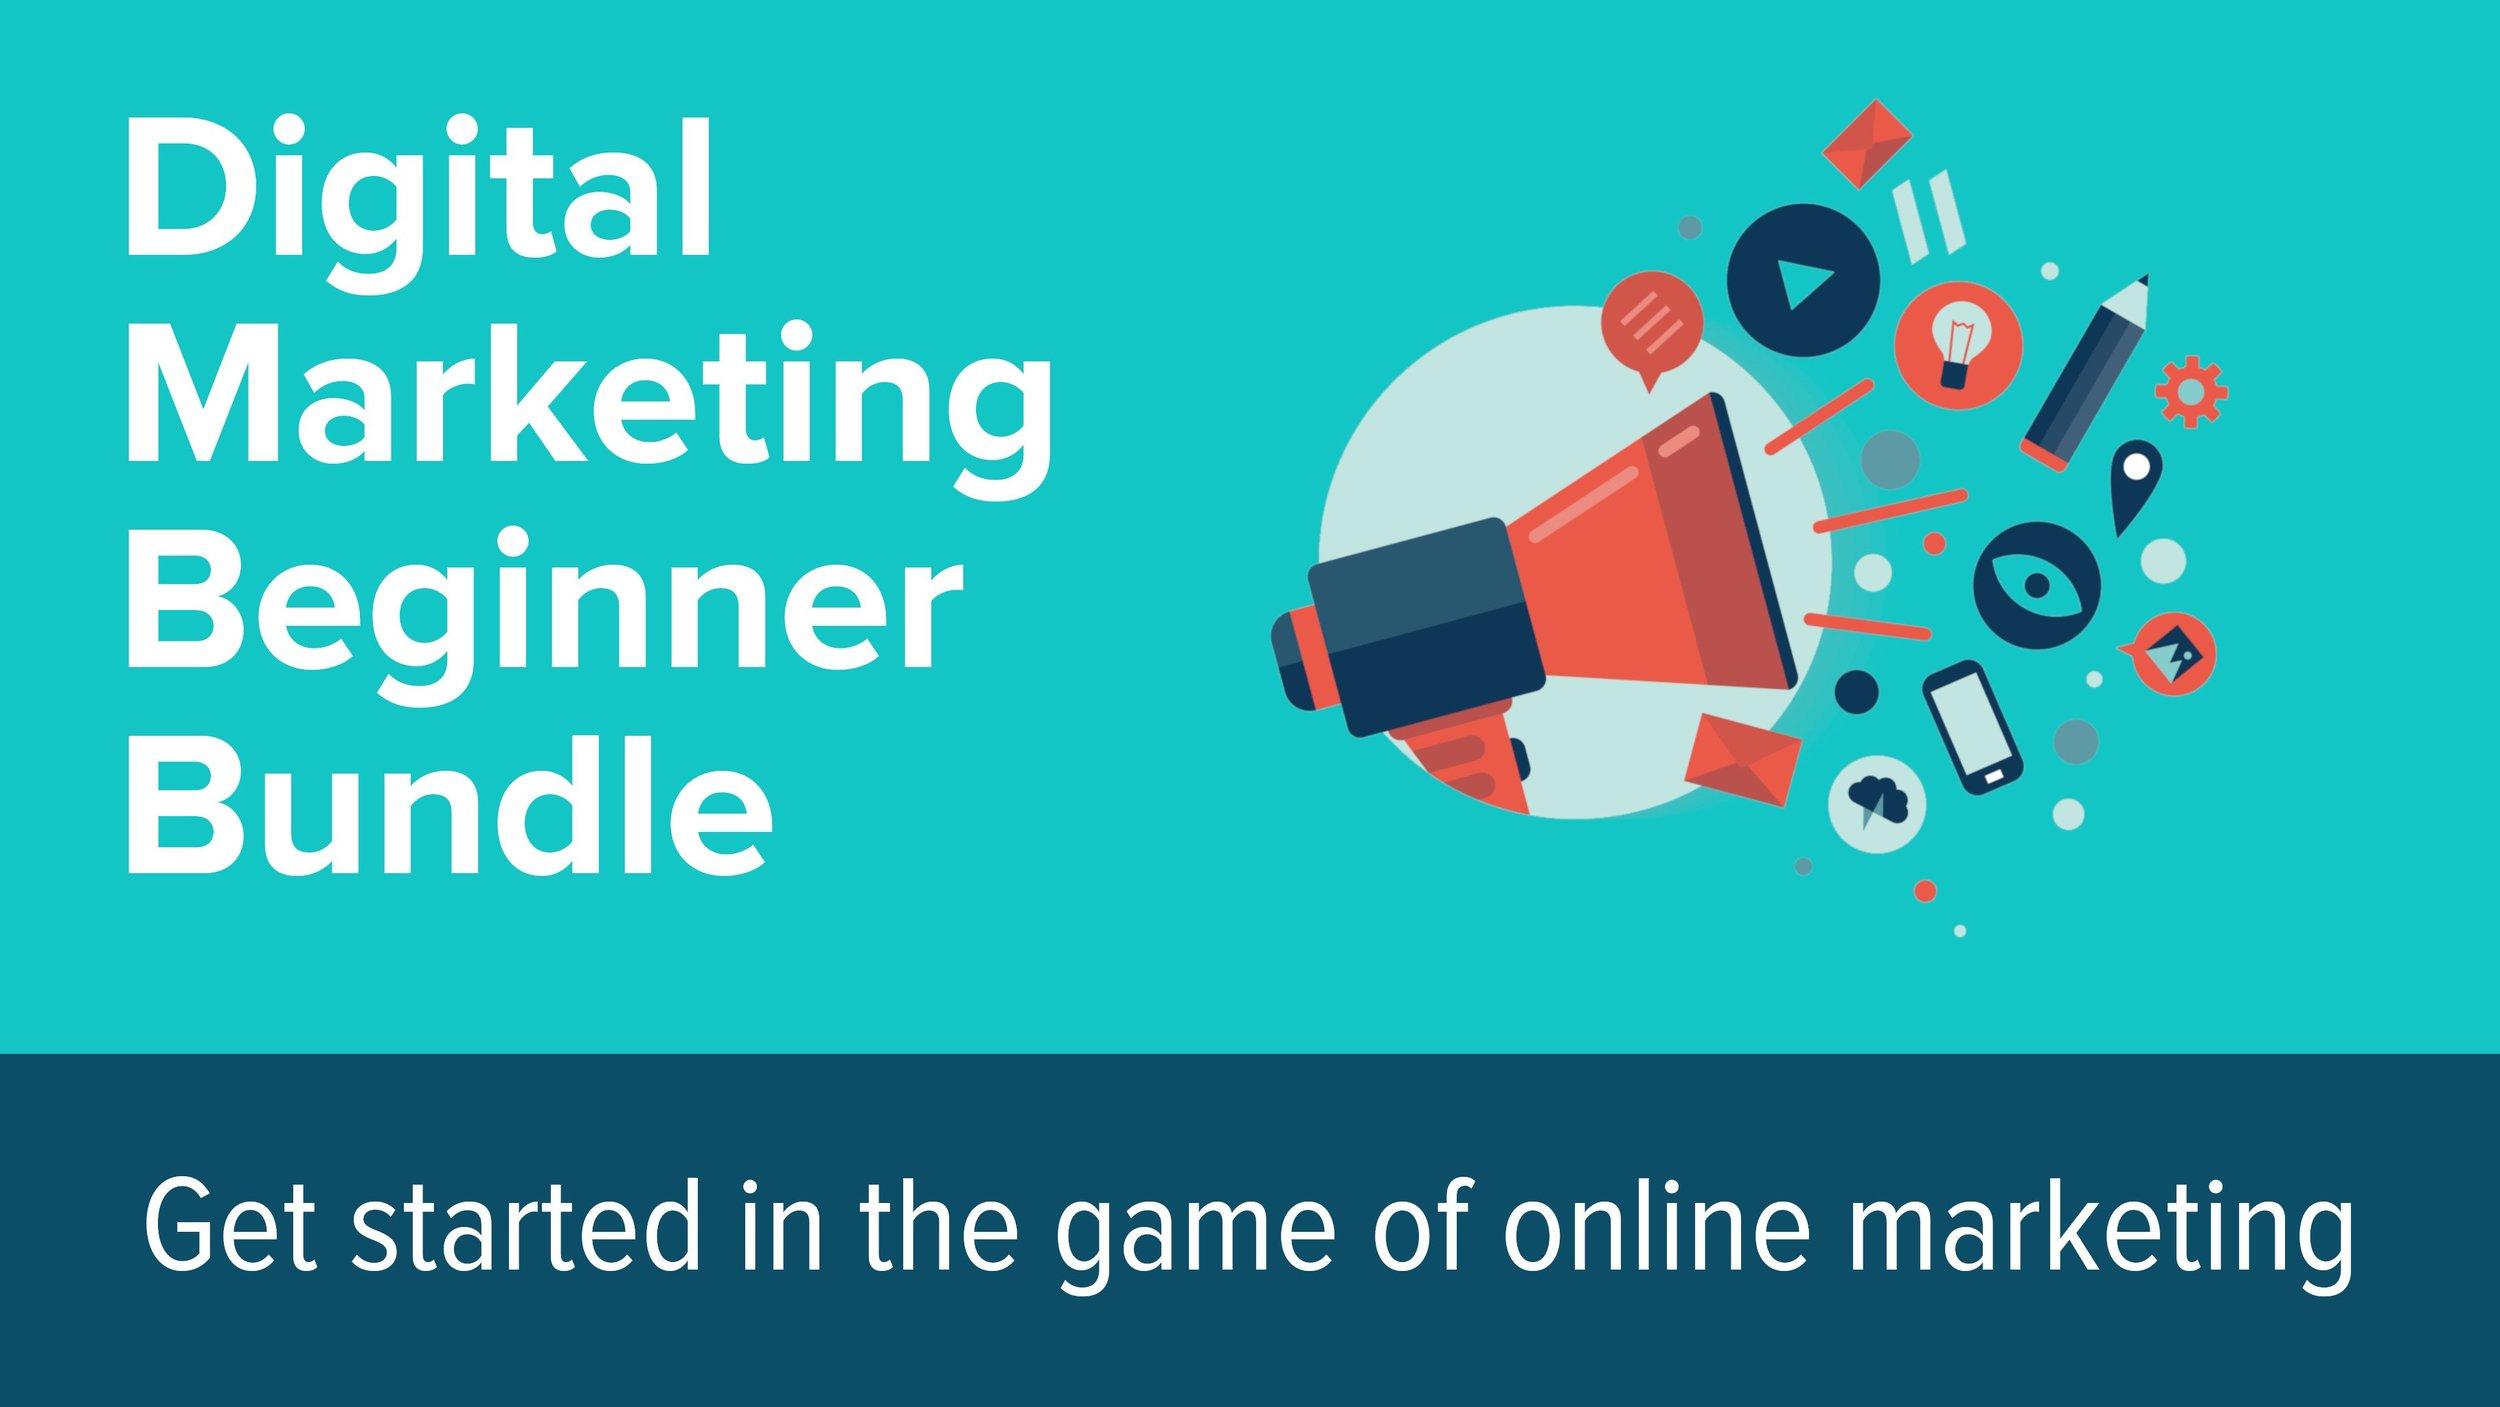 FREE_COURSE_BUNDLE_Digital_Marketing_Beginner_Bundle_Banner.jpg